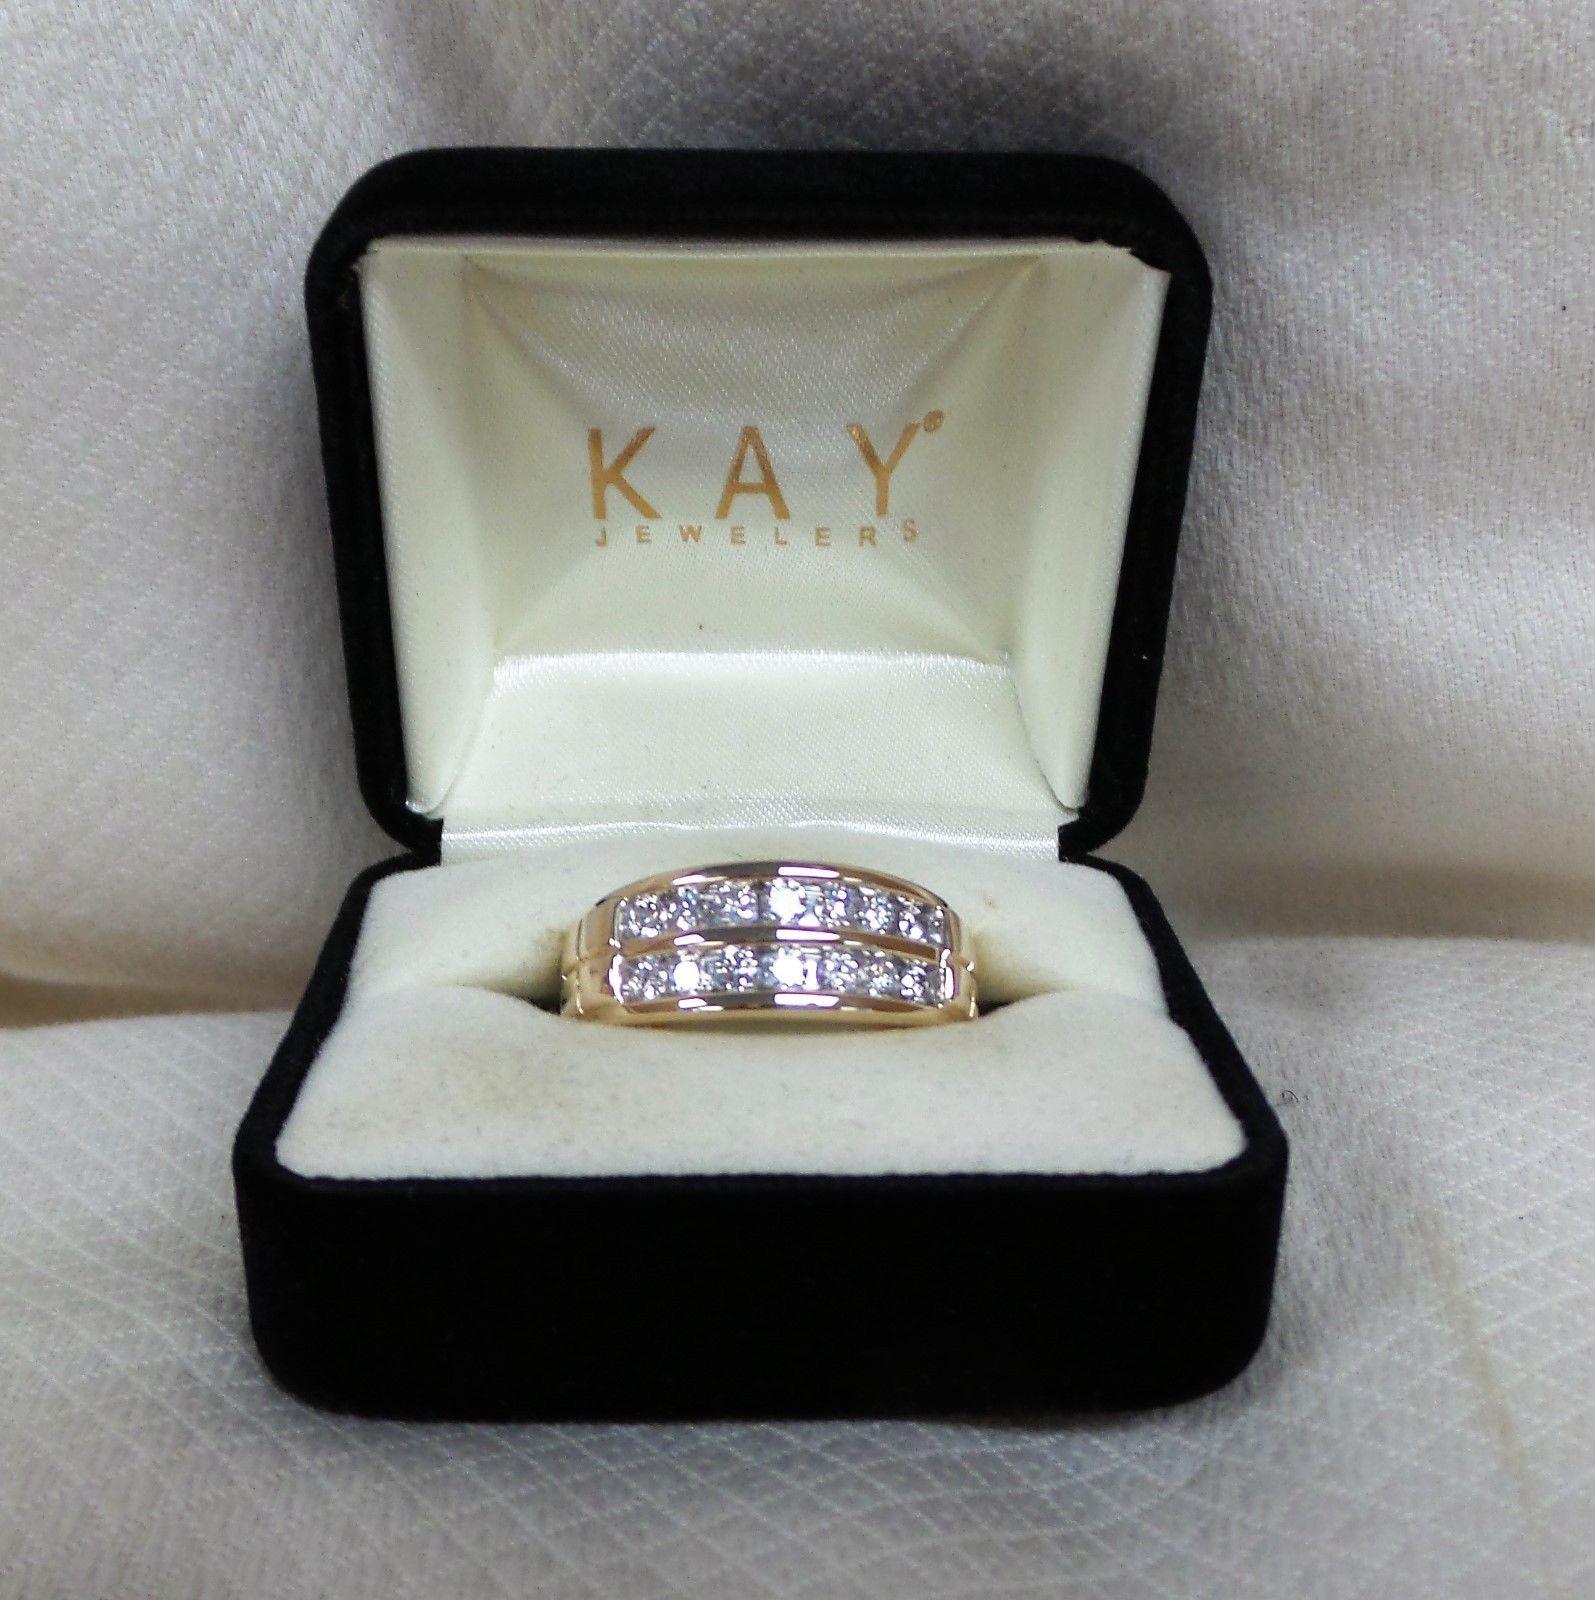 Kay Jewelers 10k Yellow Gold Mens Round Diamond Ring Band